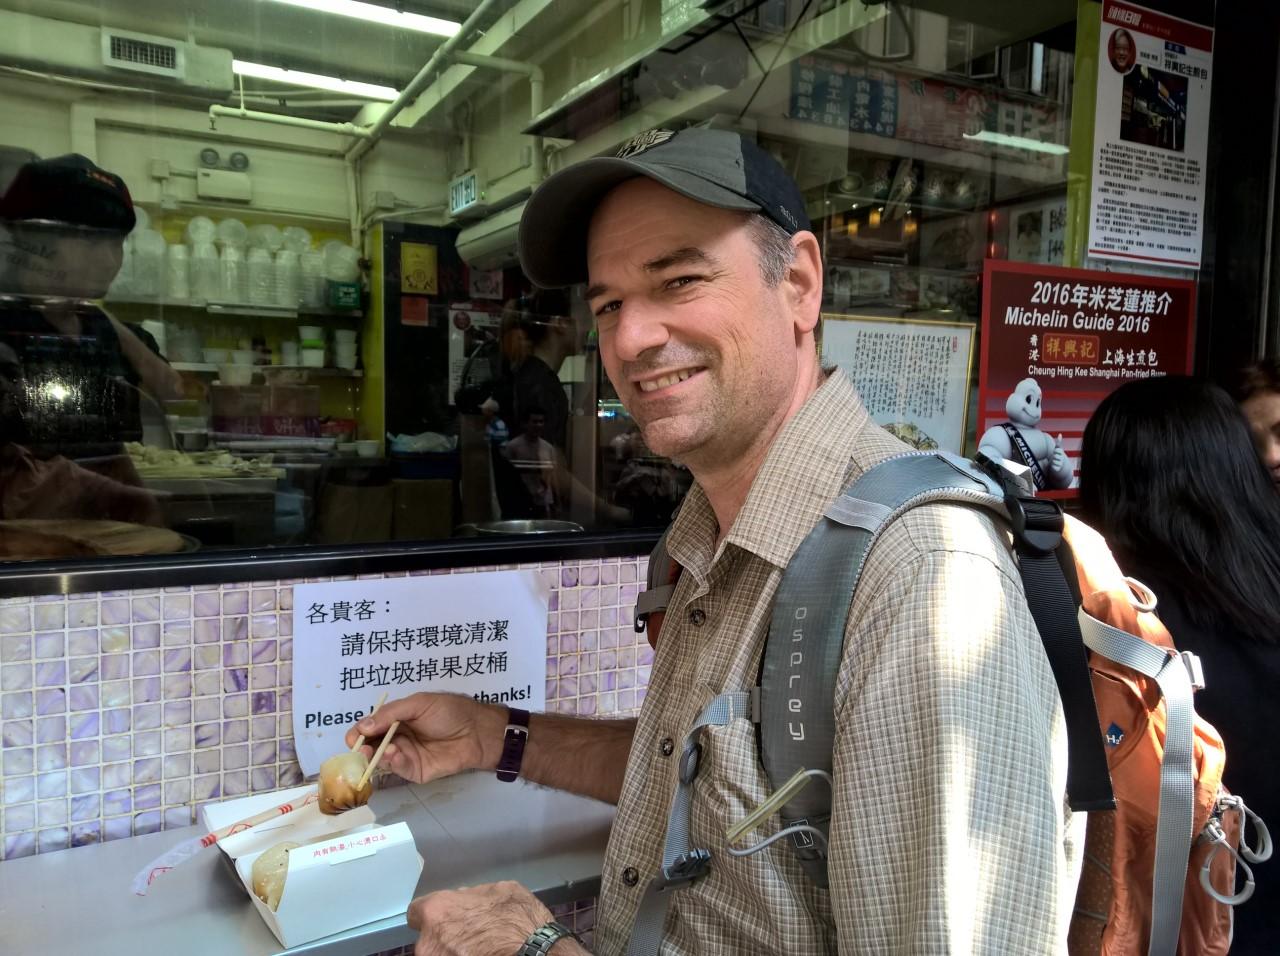 Malcolm in Hong Kong